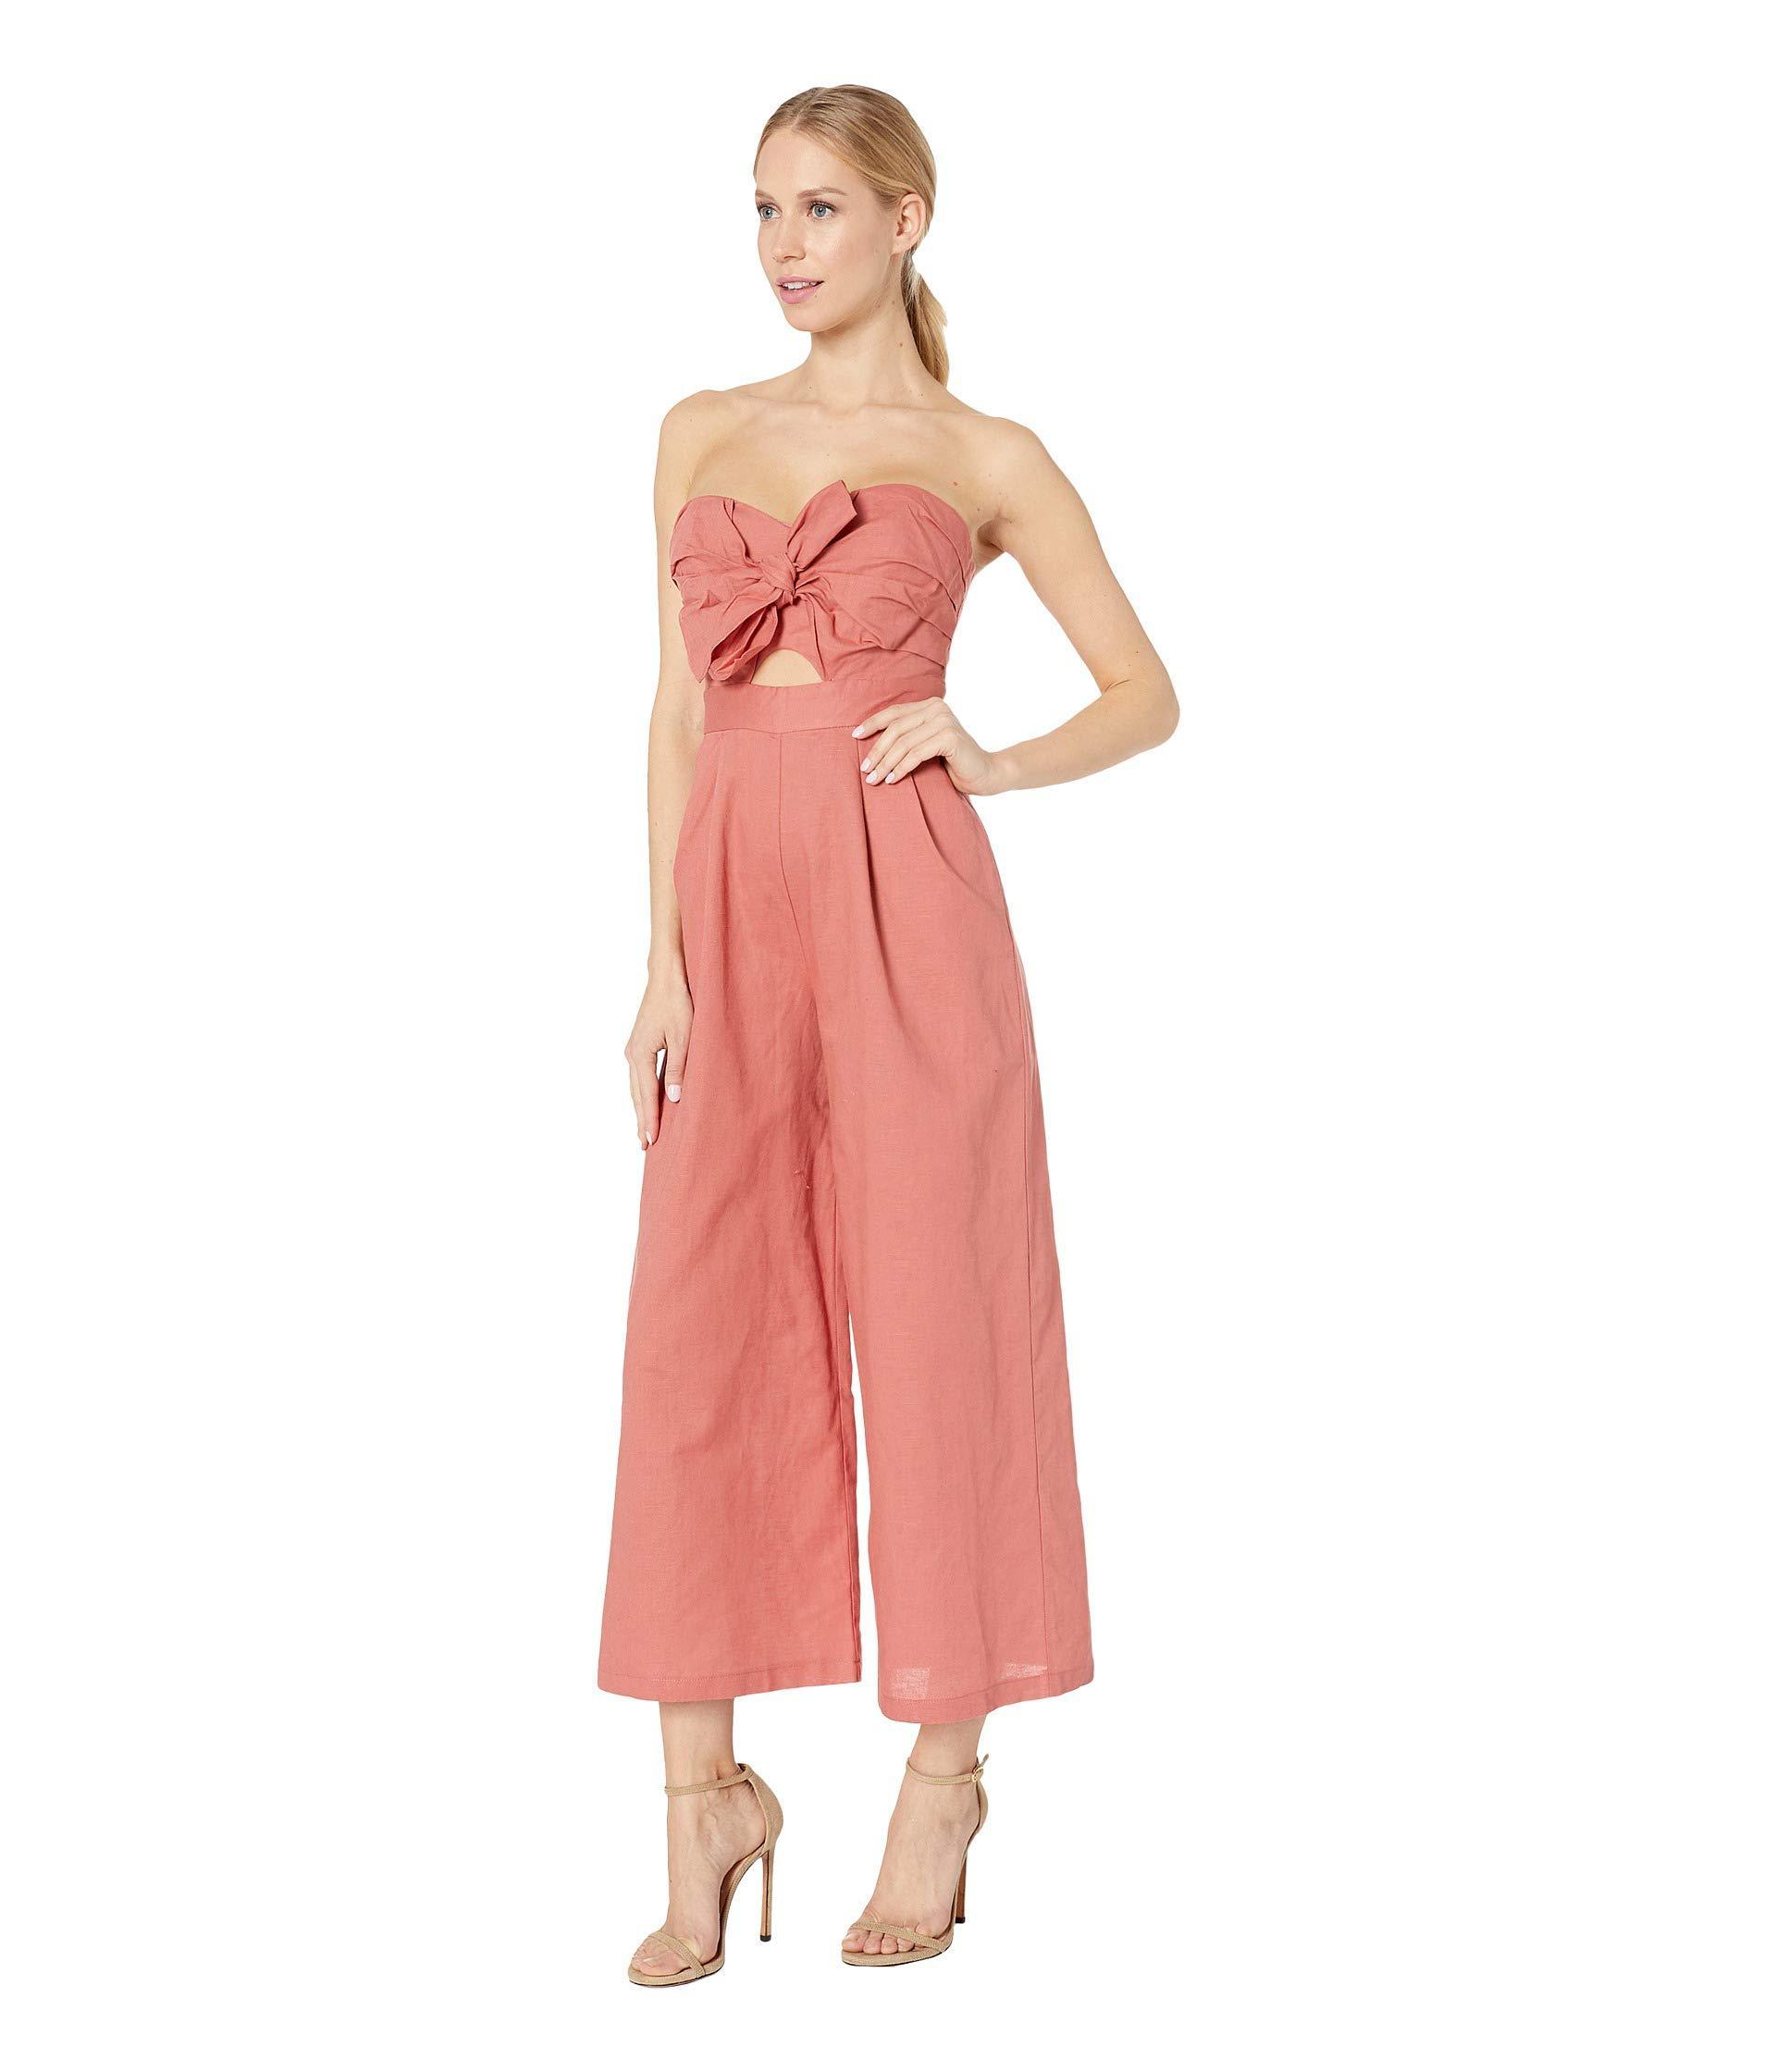 a9feba20967 Lyst - Astr Mara Jumpsuit (black white Stripe) Women s Jumpsuit   Rompers  One Piece in Pink